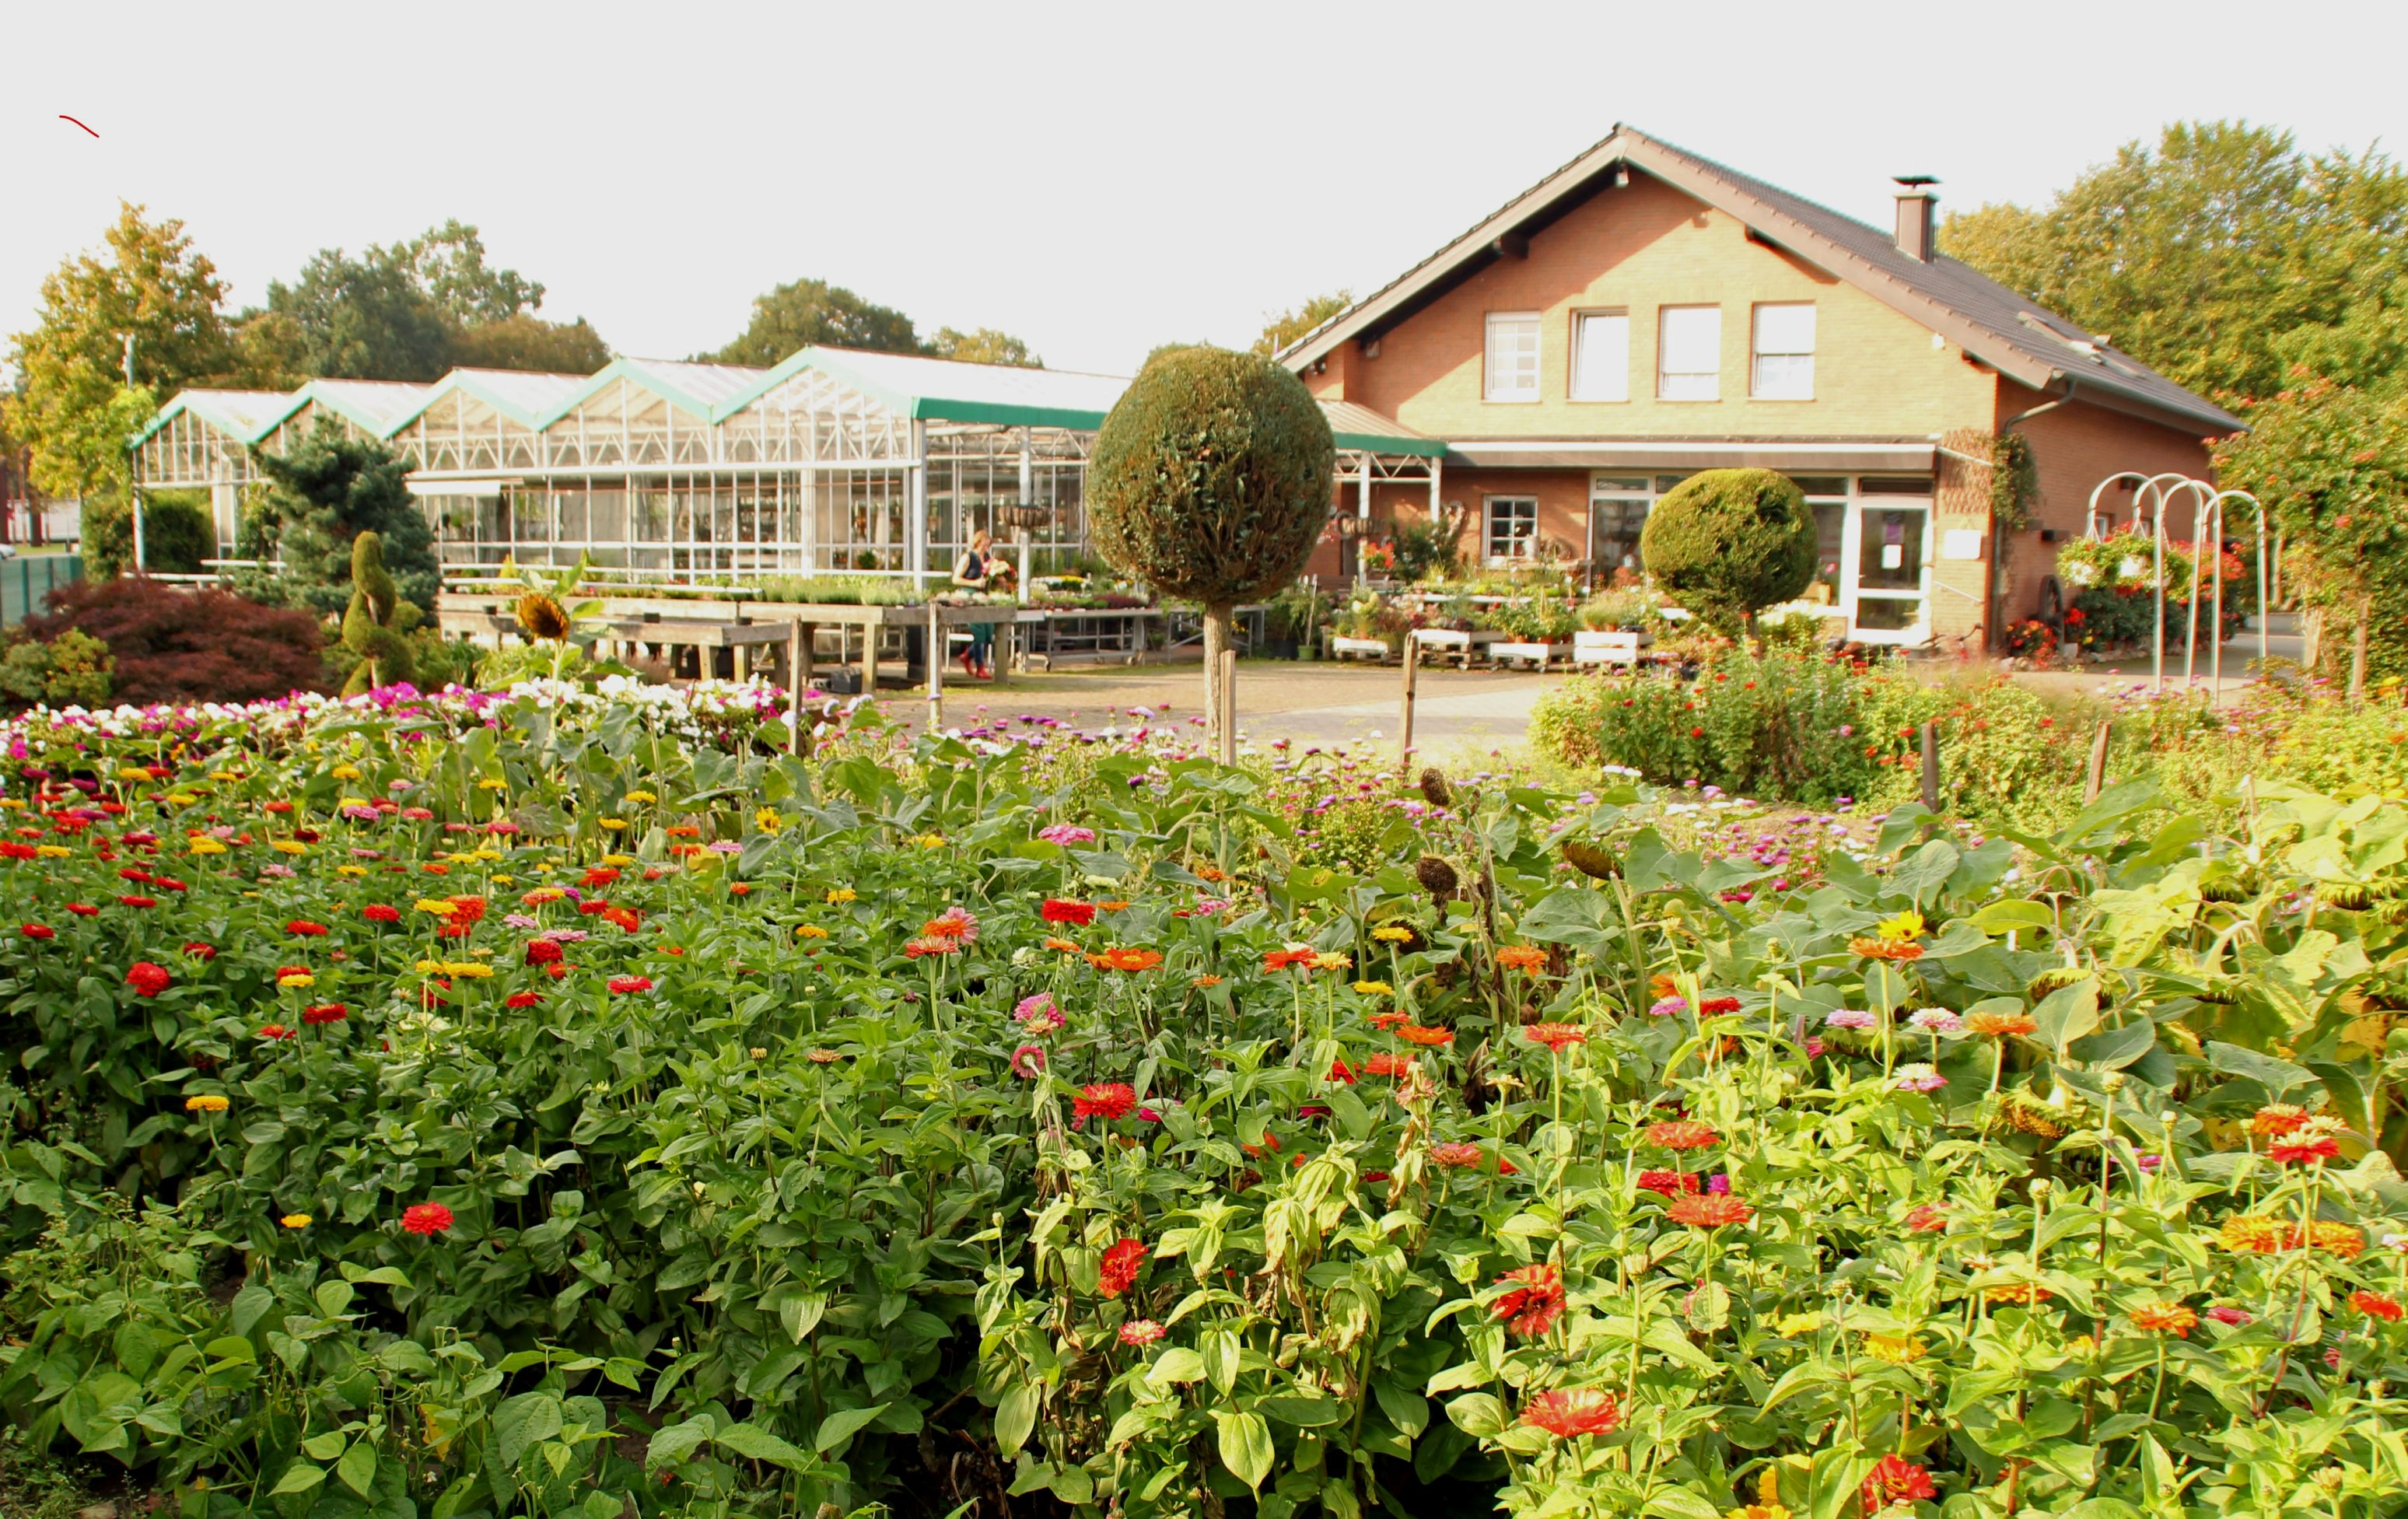 Struck Gartenbau